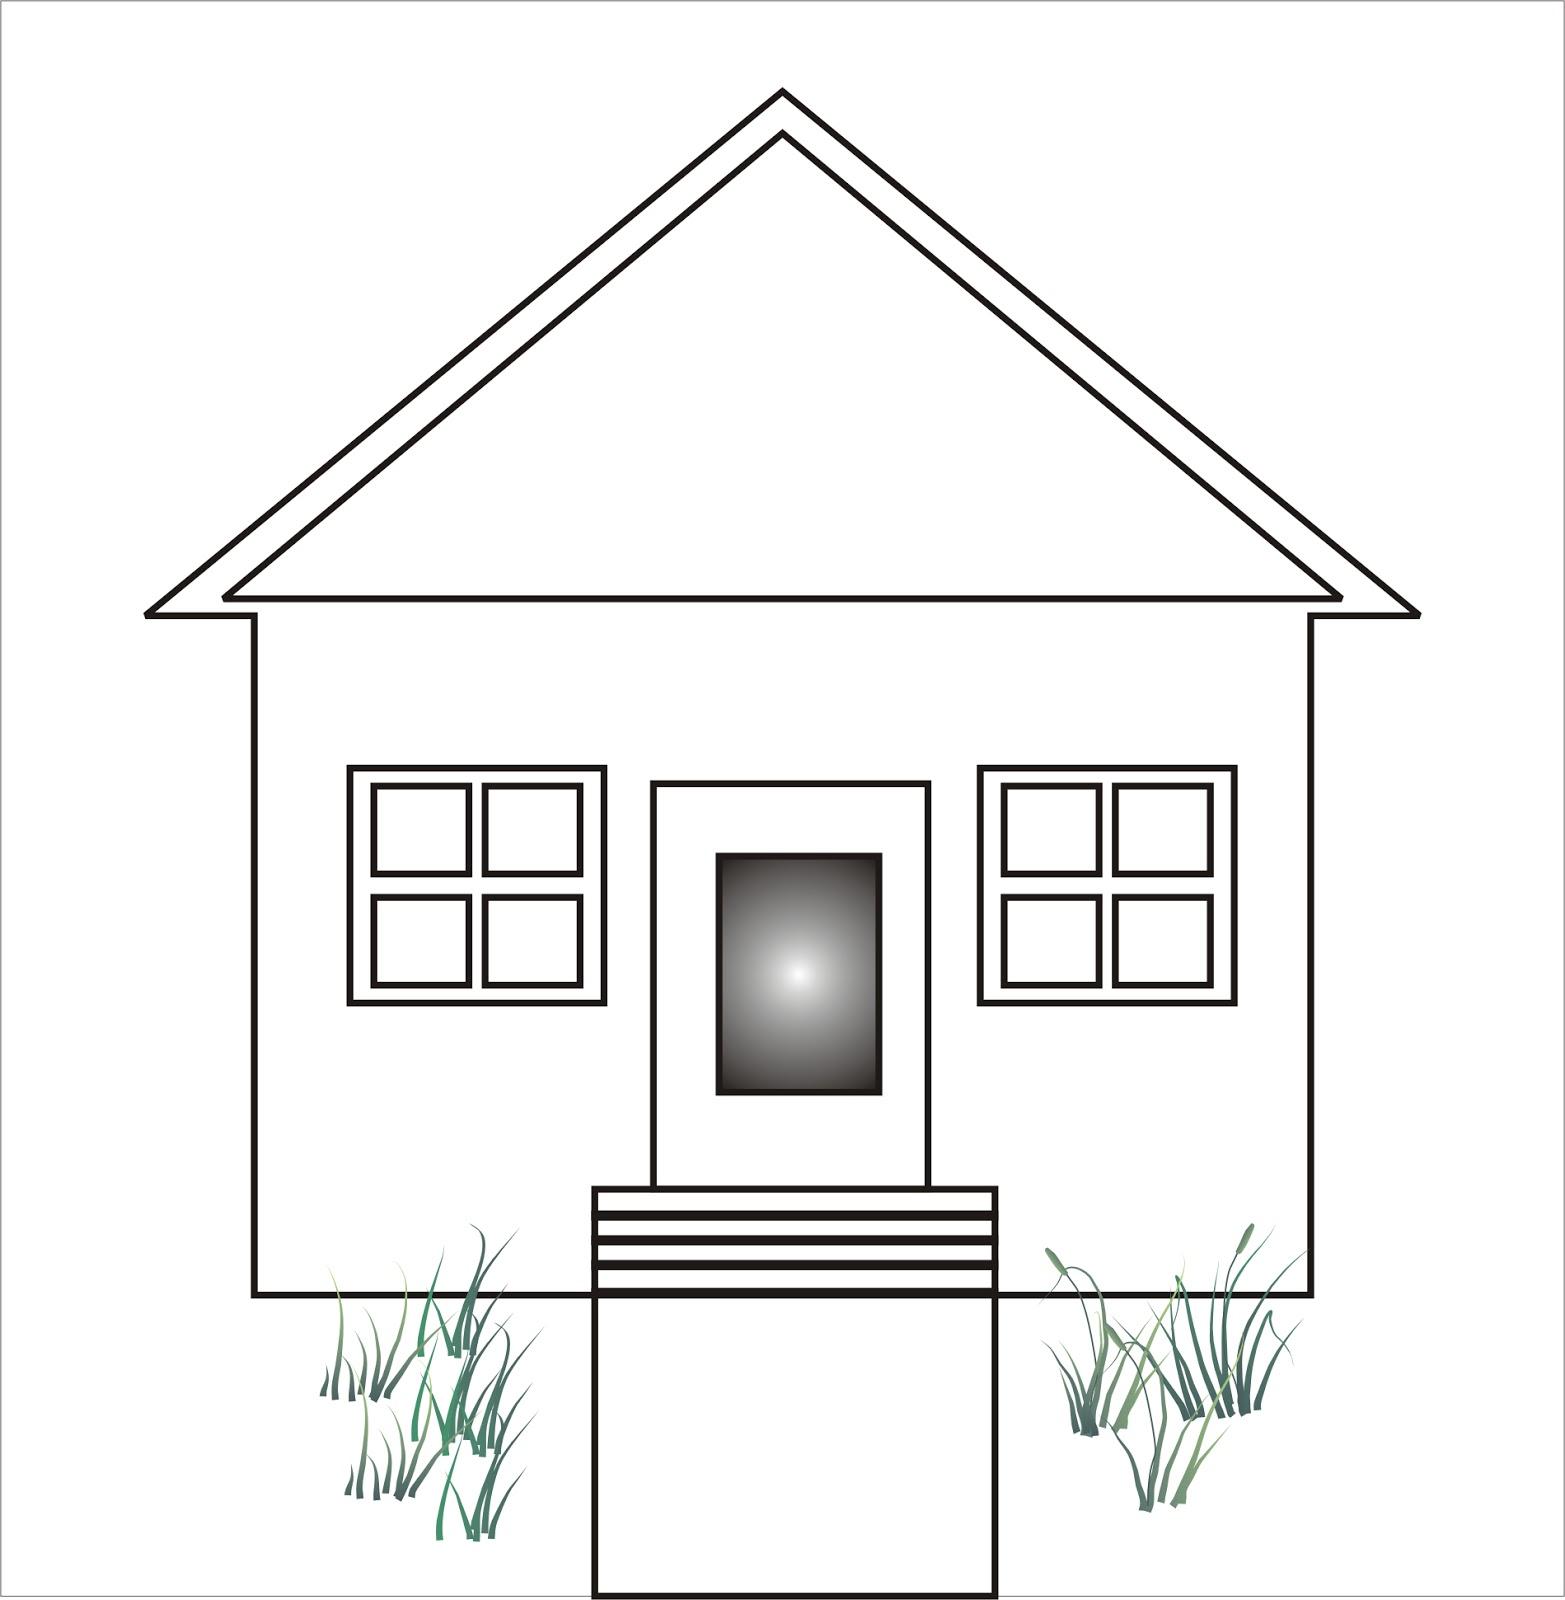 Cara Menggambar Rumah | Cerita Tentang Semut